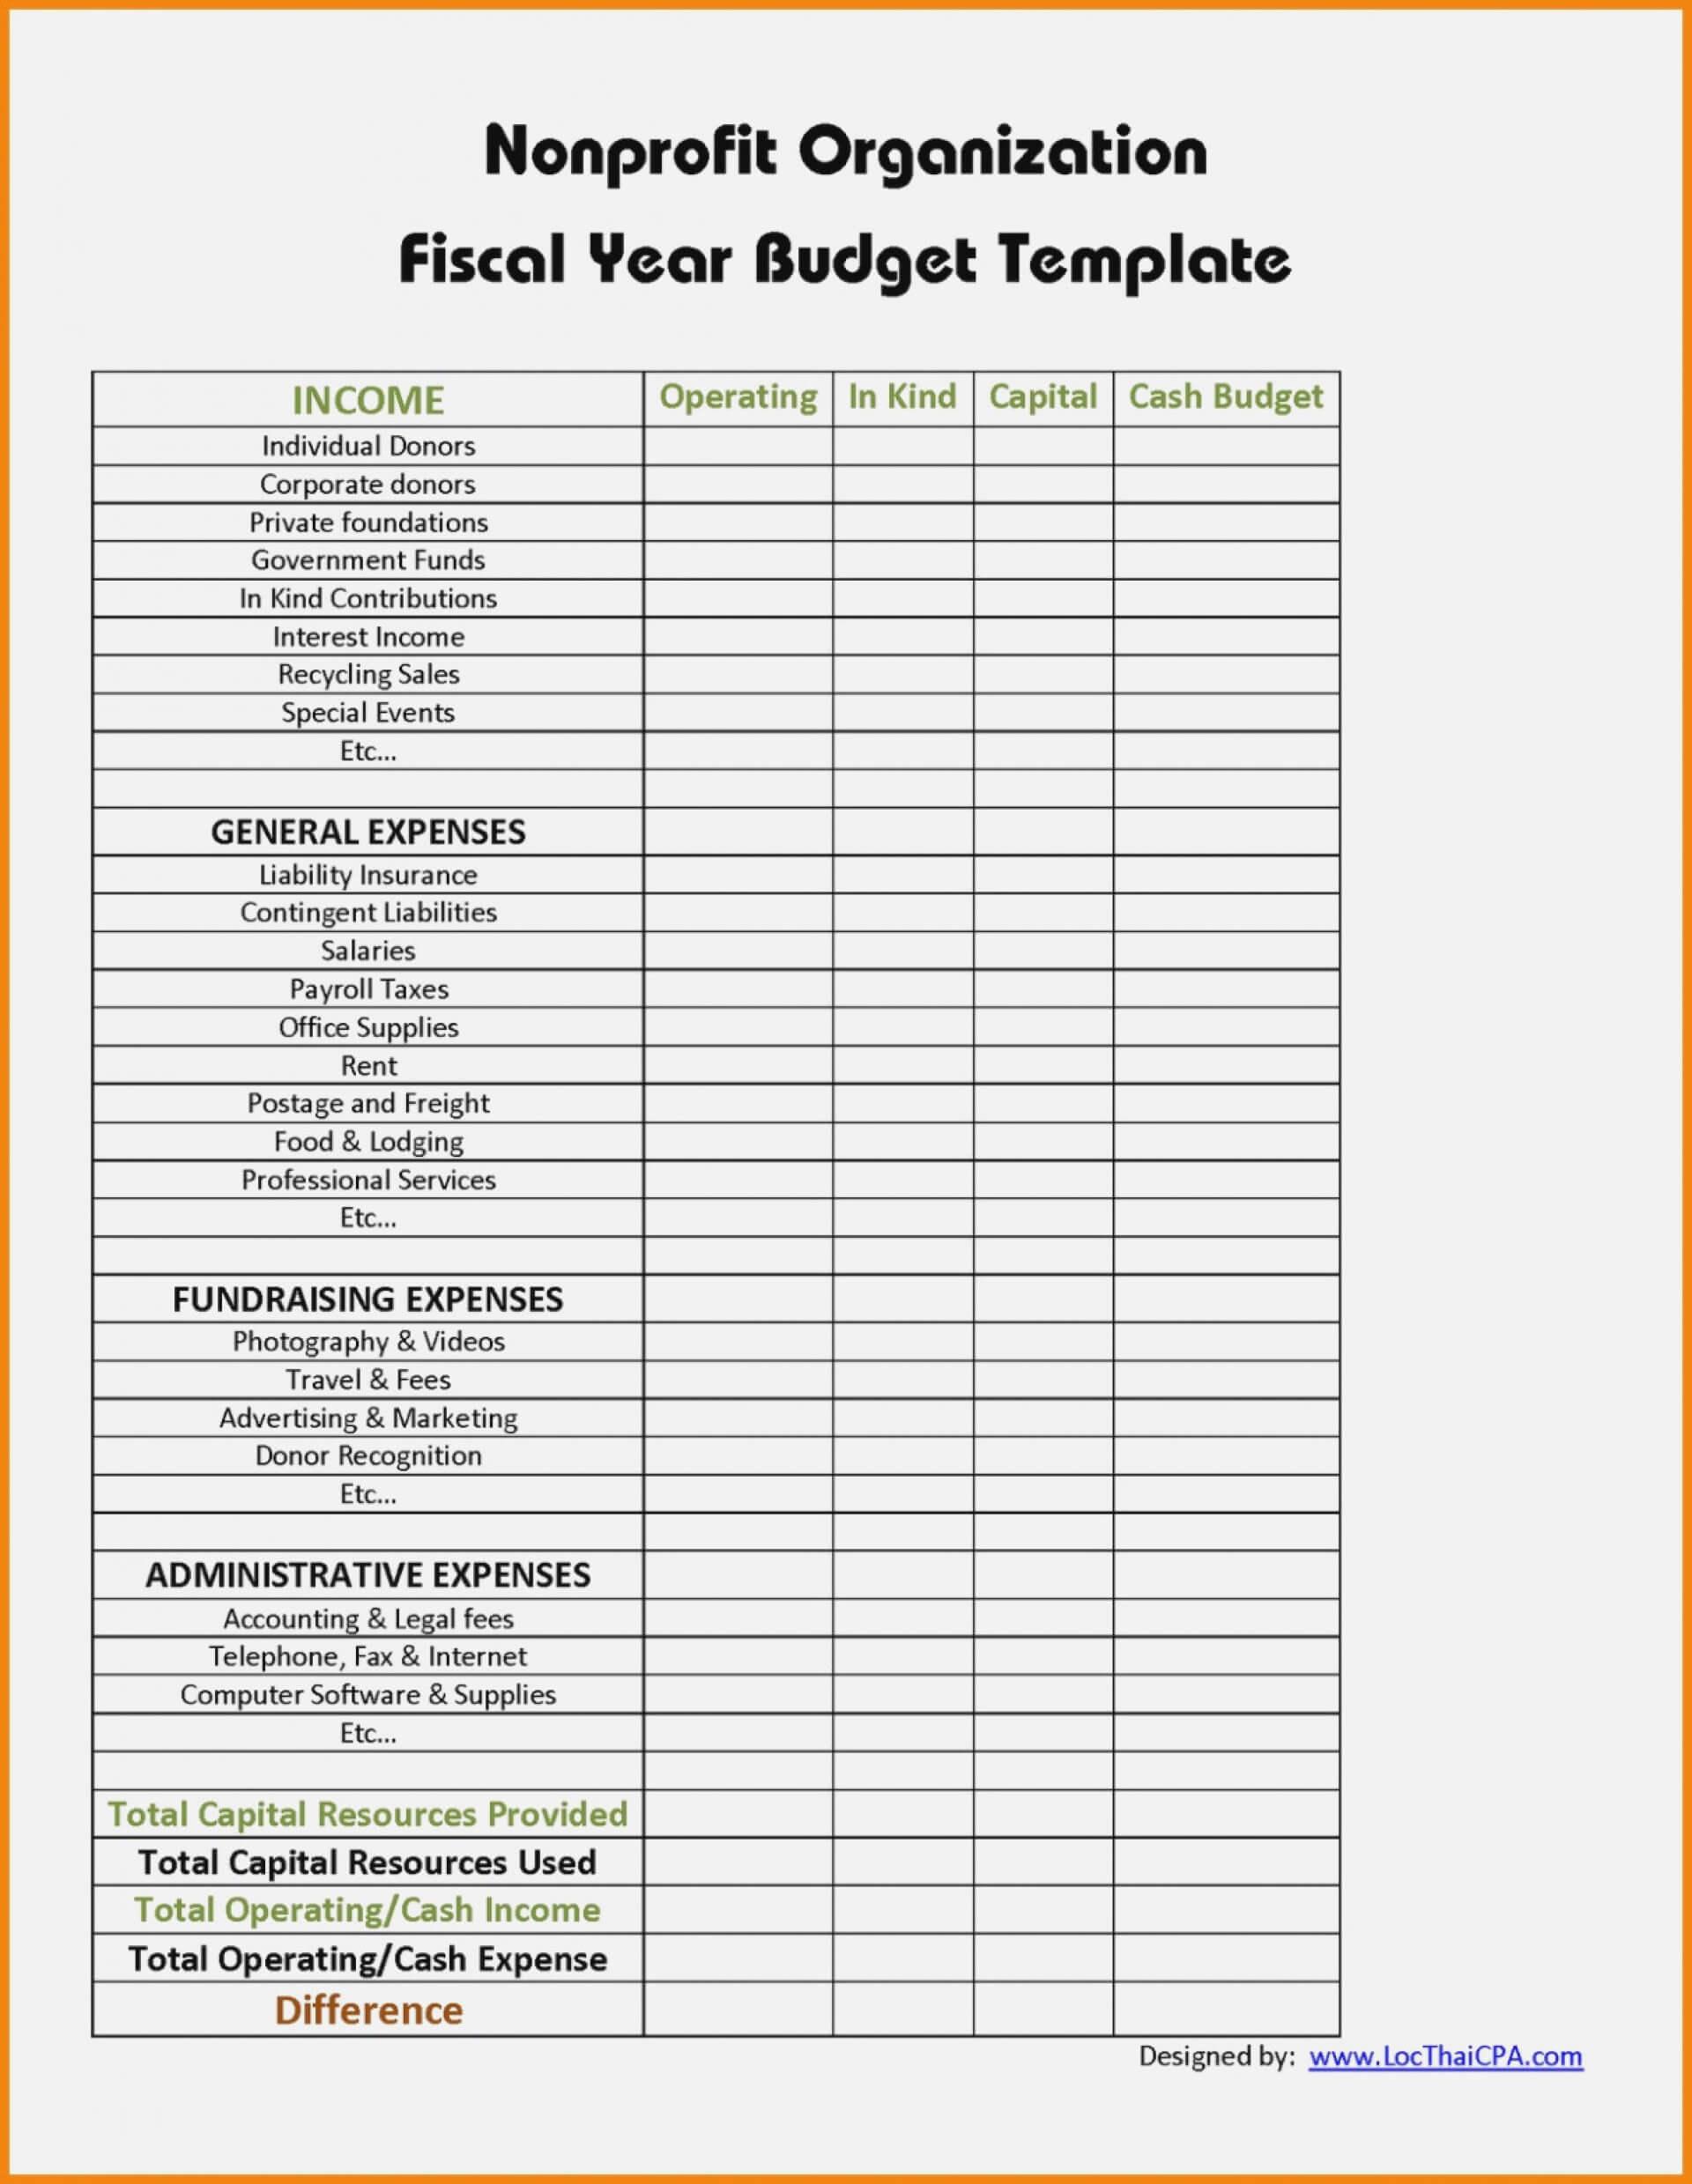 005 Treasurers Report Template Non Profit Excel Ideas Intended For Treasurer Report Template Non Profit